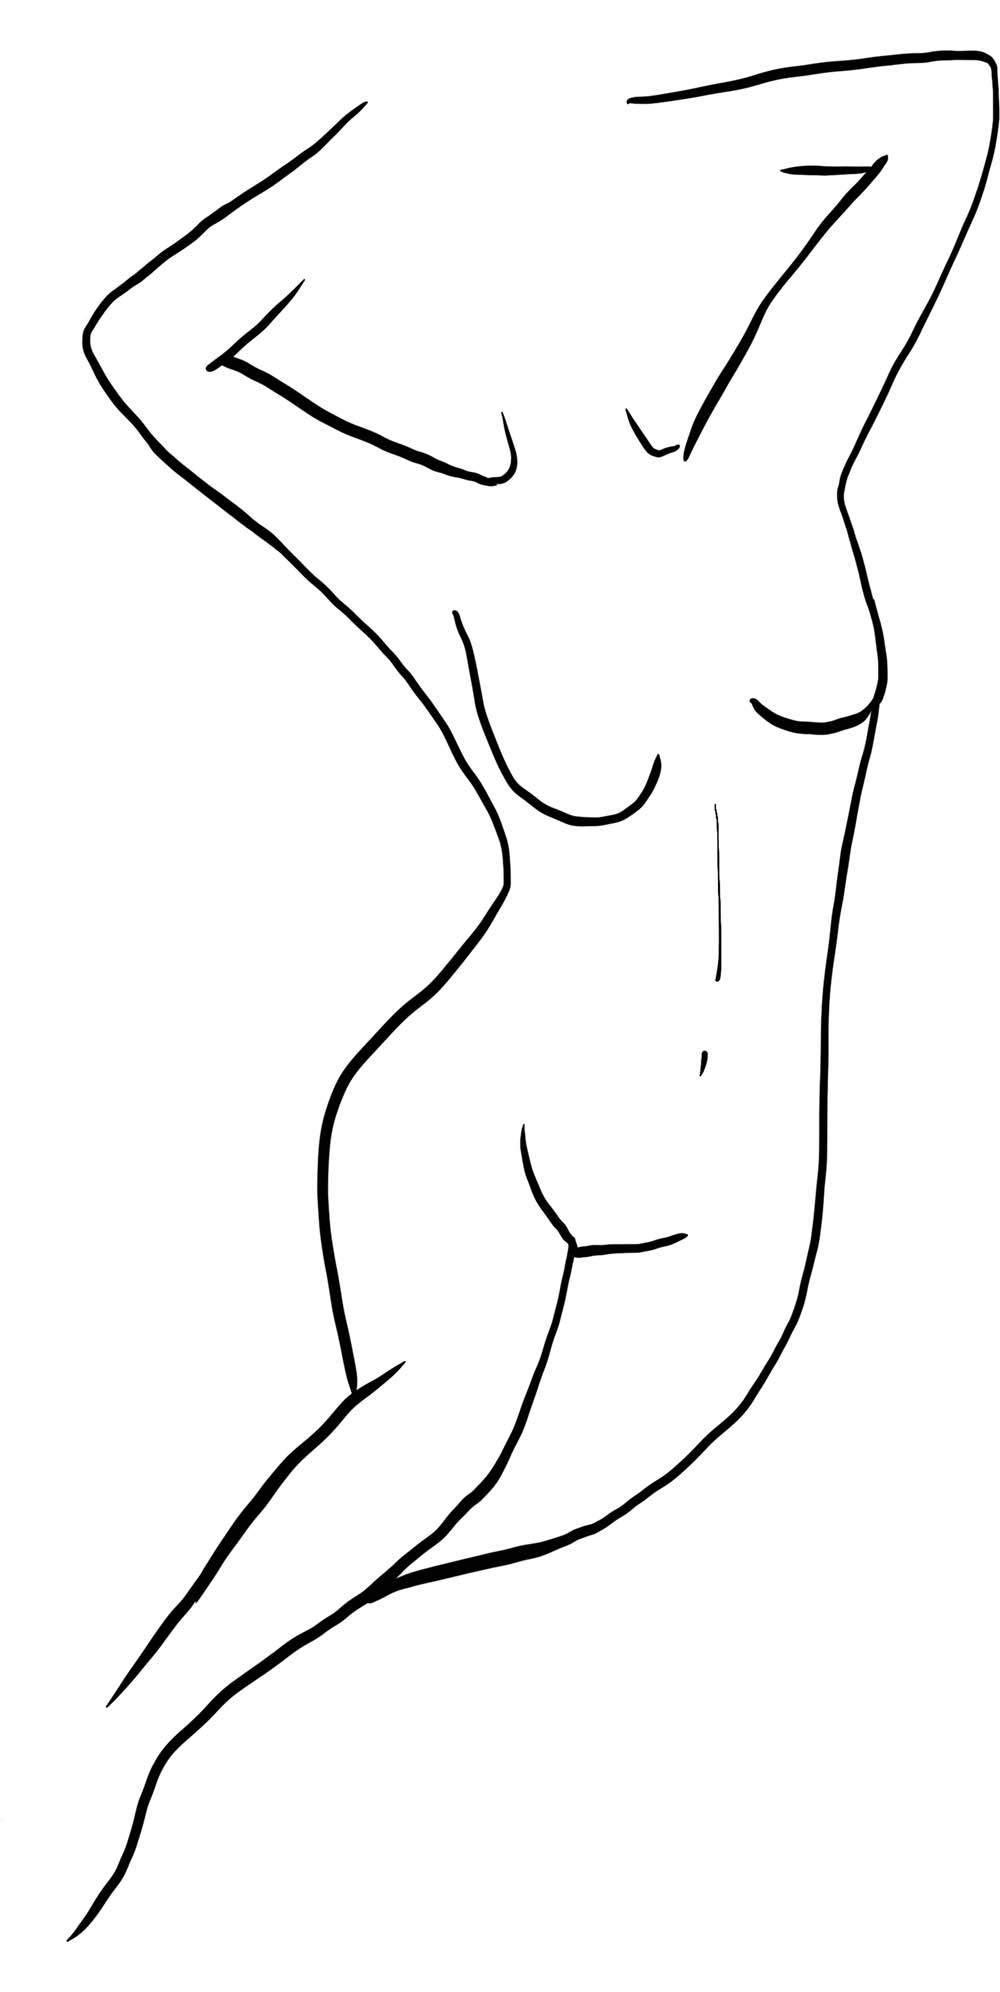 do nipple piercings make you horny